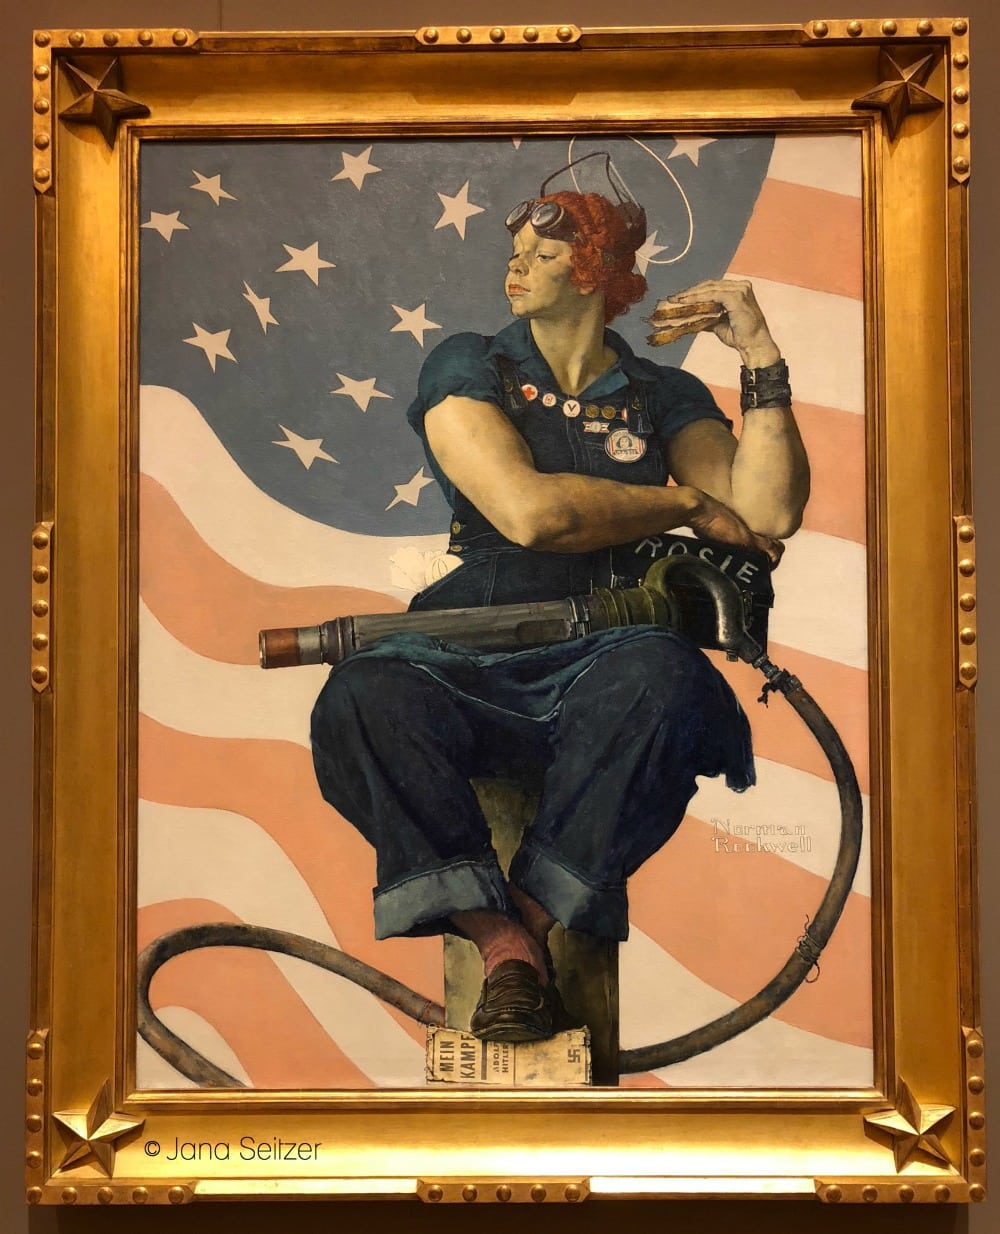 Crystal Bridges Museum - Art in Bentonville, Arkansas - Rosie the Riveter